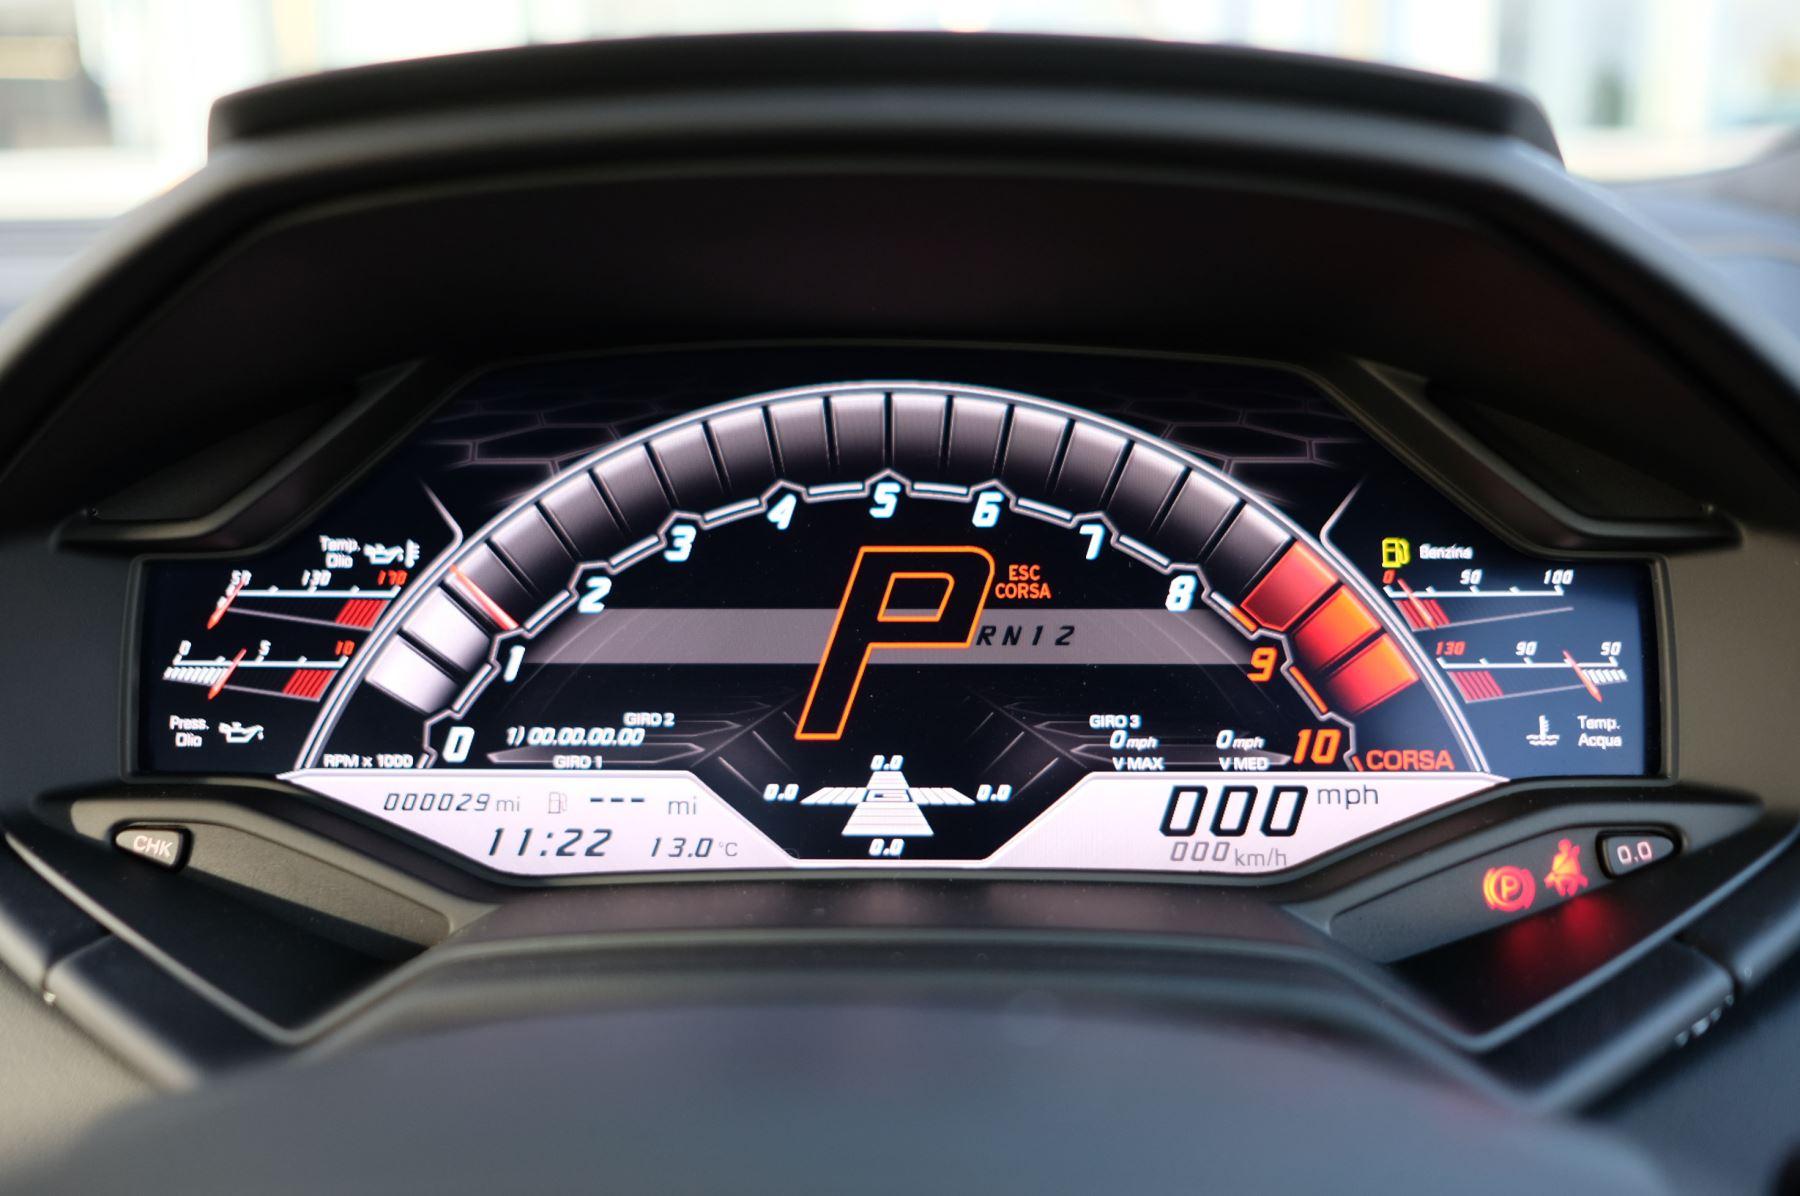 Lamborghini Huracan EVO Spyder 5.2 V10 640 2dr Auto AWD image 24